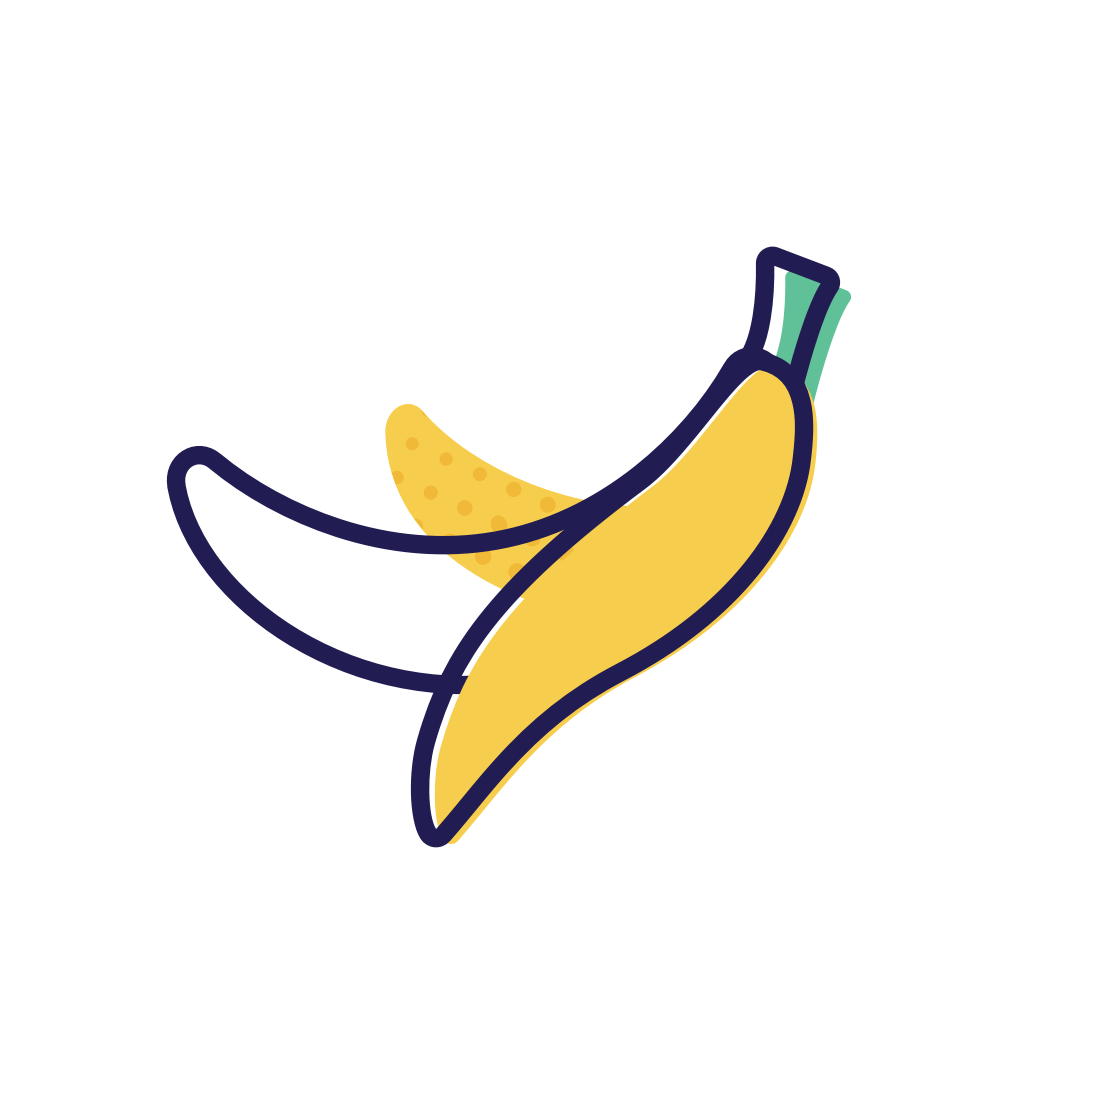 banana [ 1100 x 1100 Pixel ]